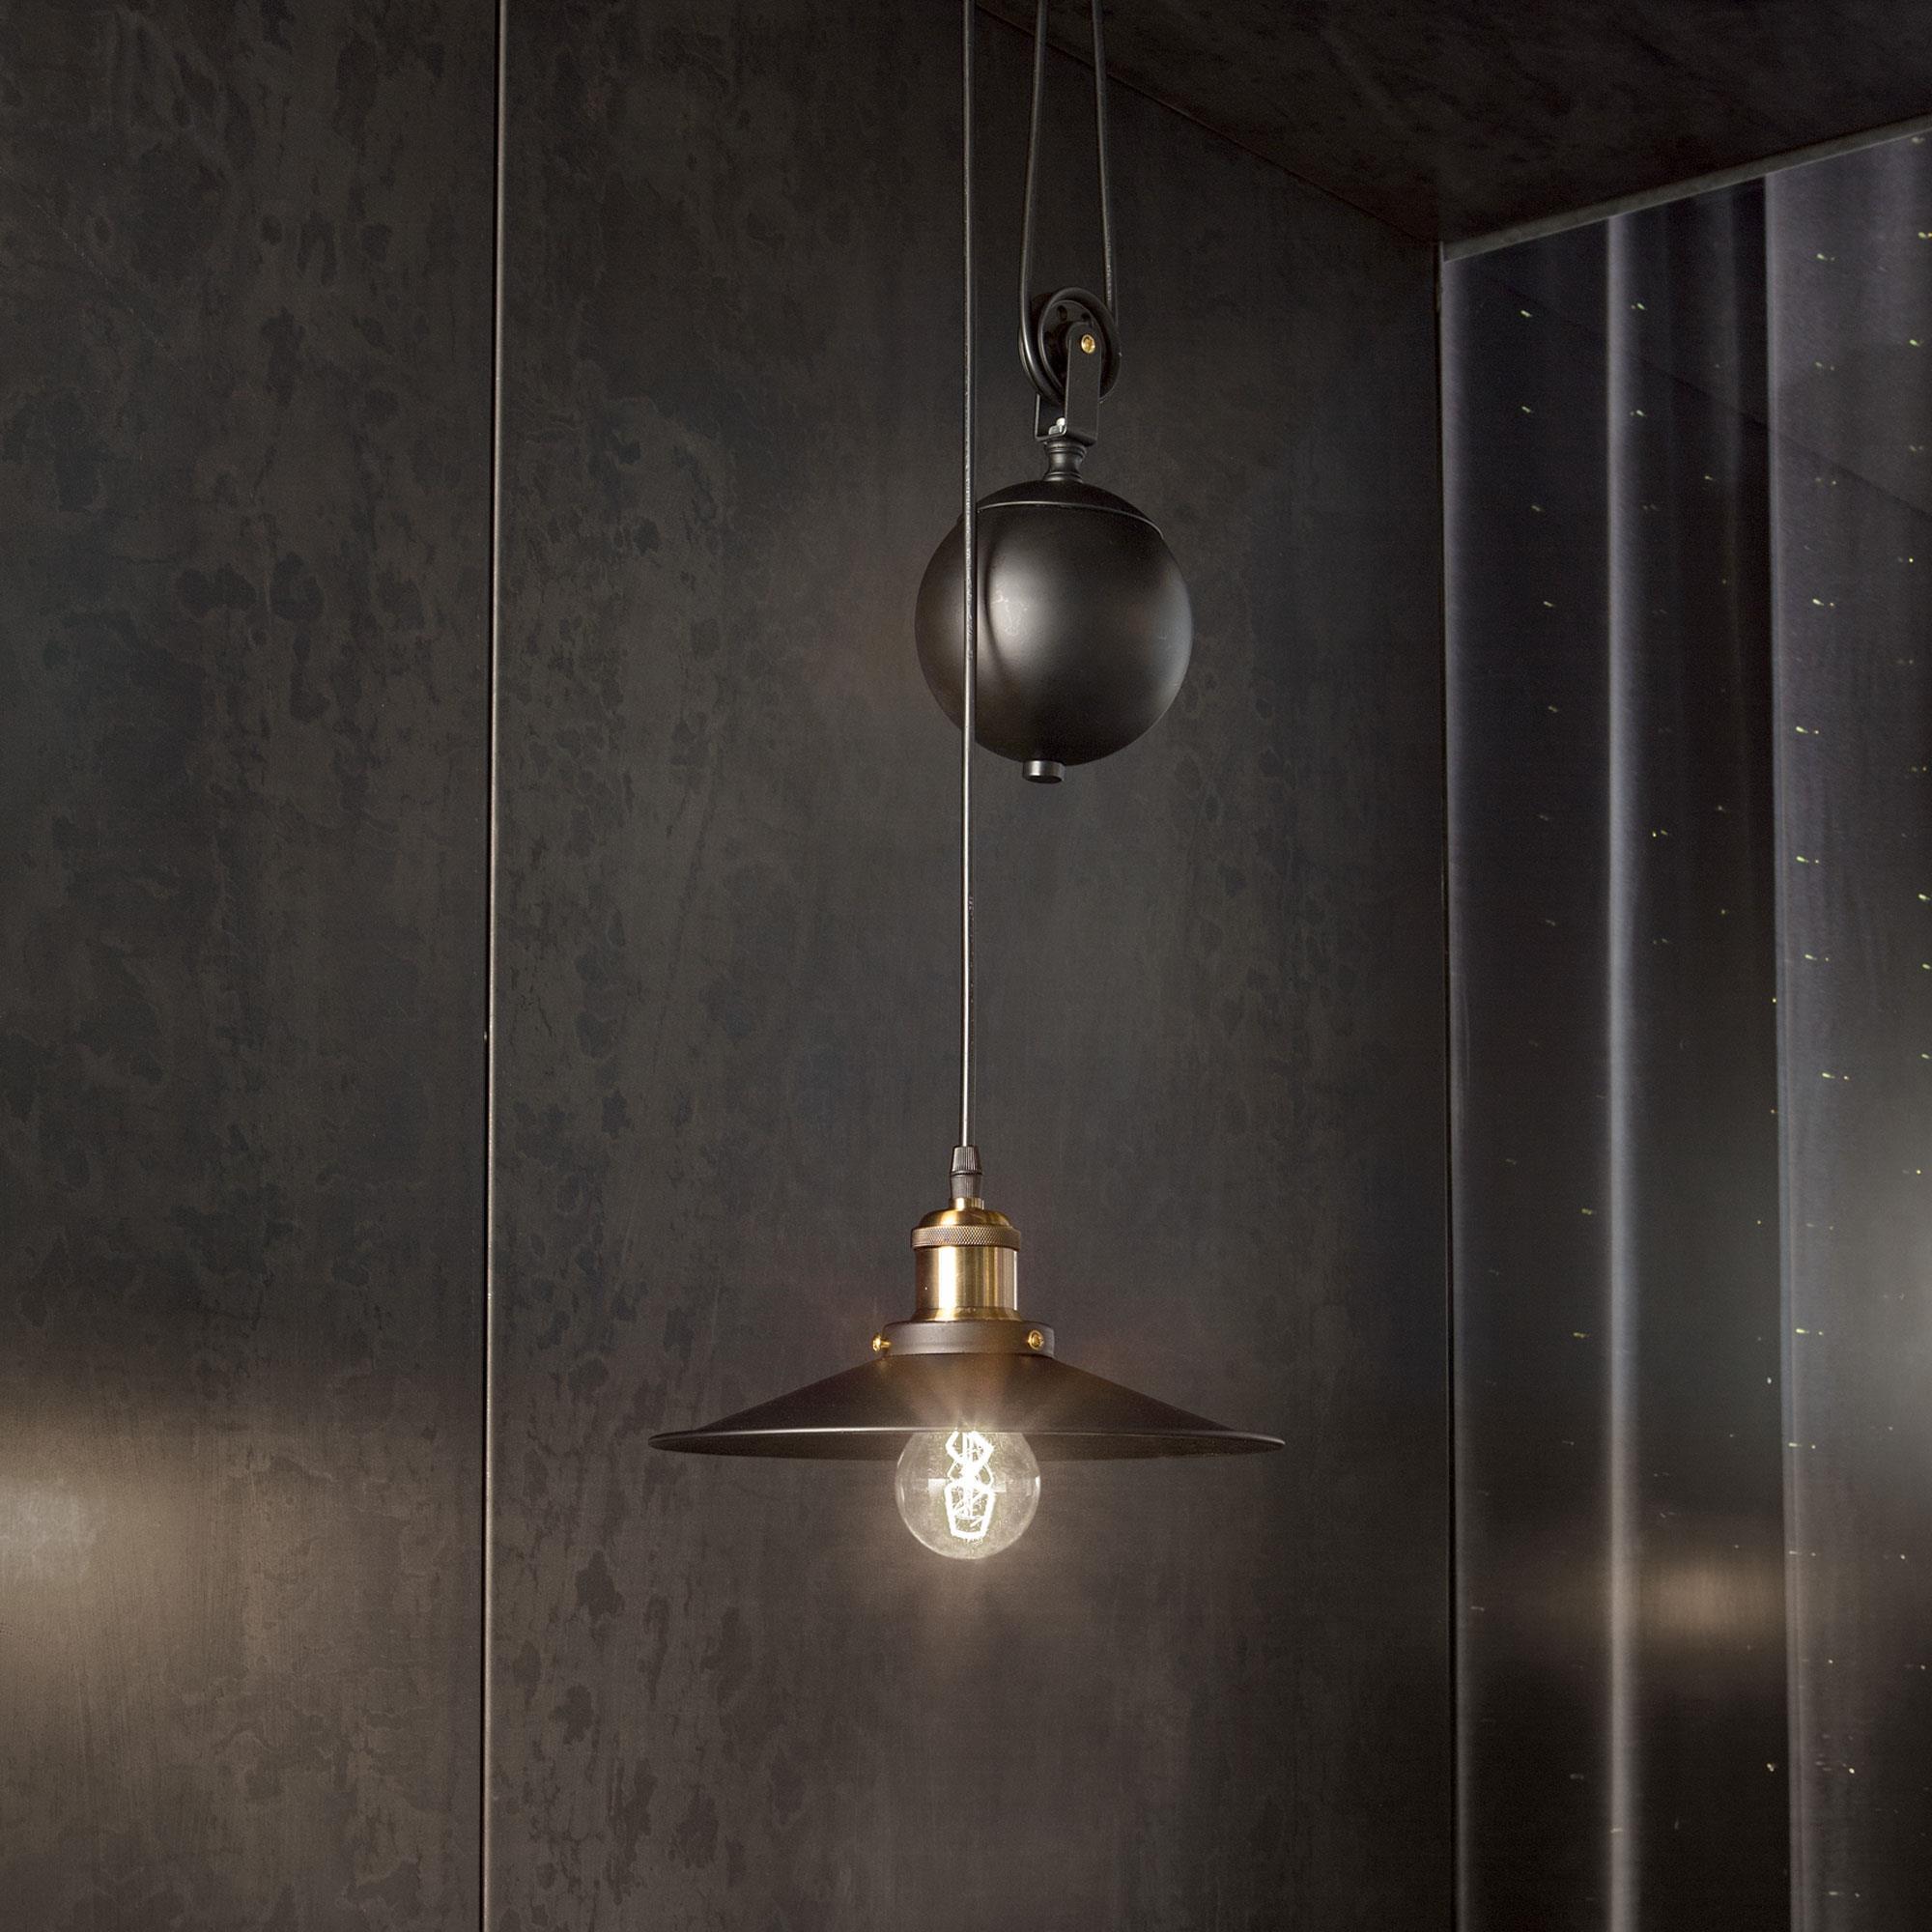 Ideal Lux 136332 UP AND DOWN SP1 lámpa függeszték